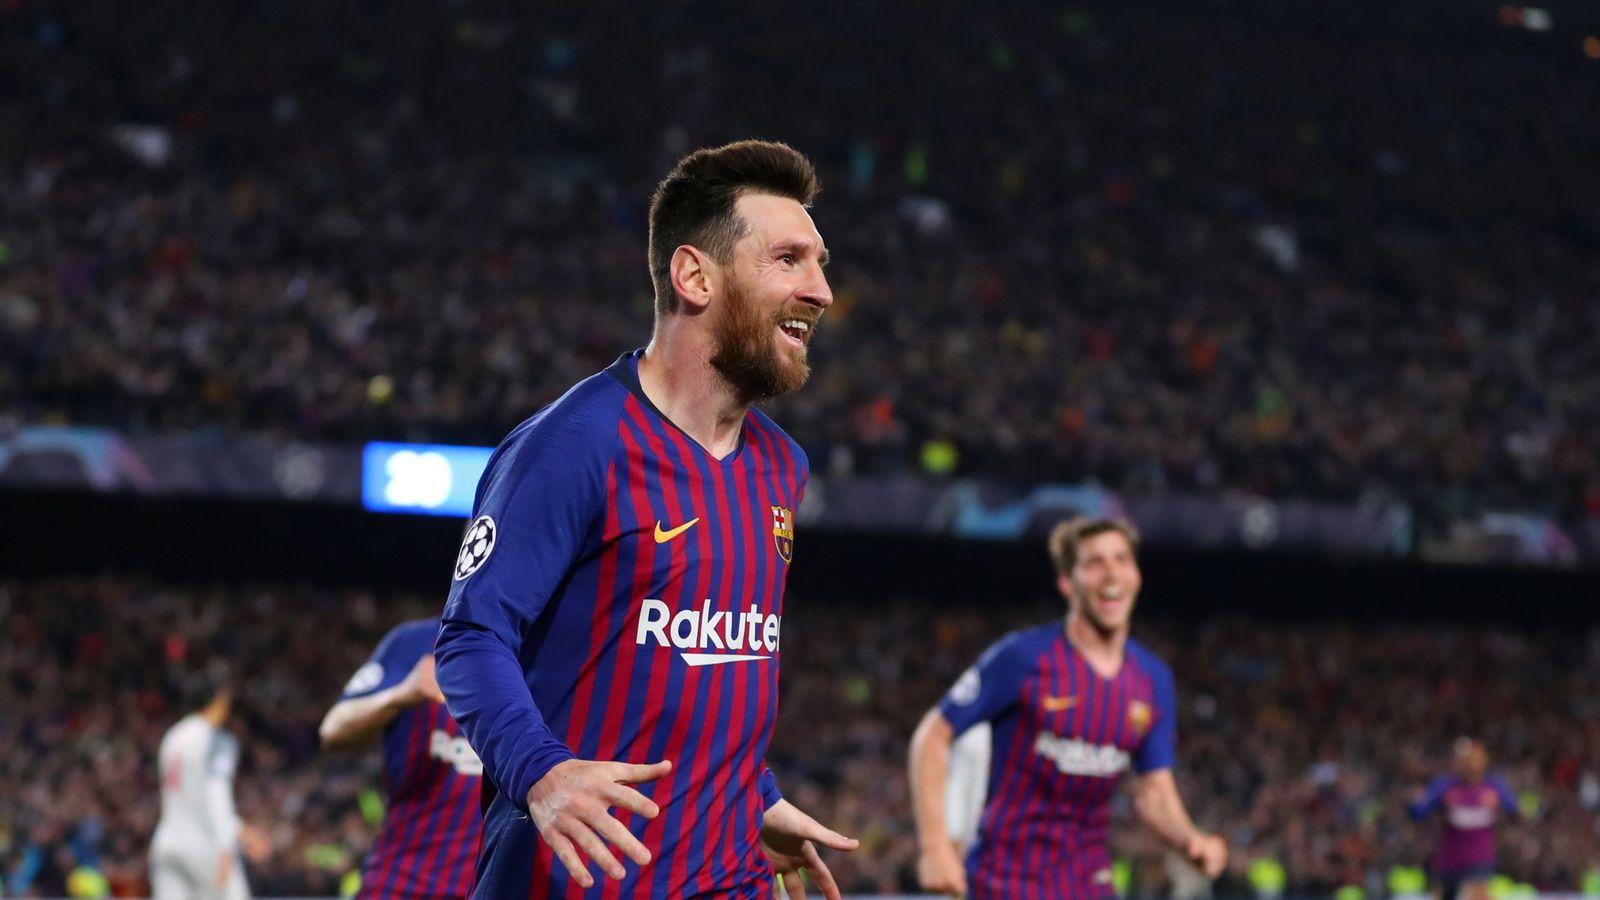 Barcelona 3 - 0 Liverpool - Match Report & Highlights